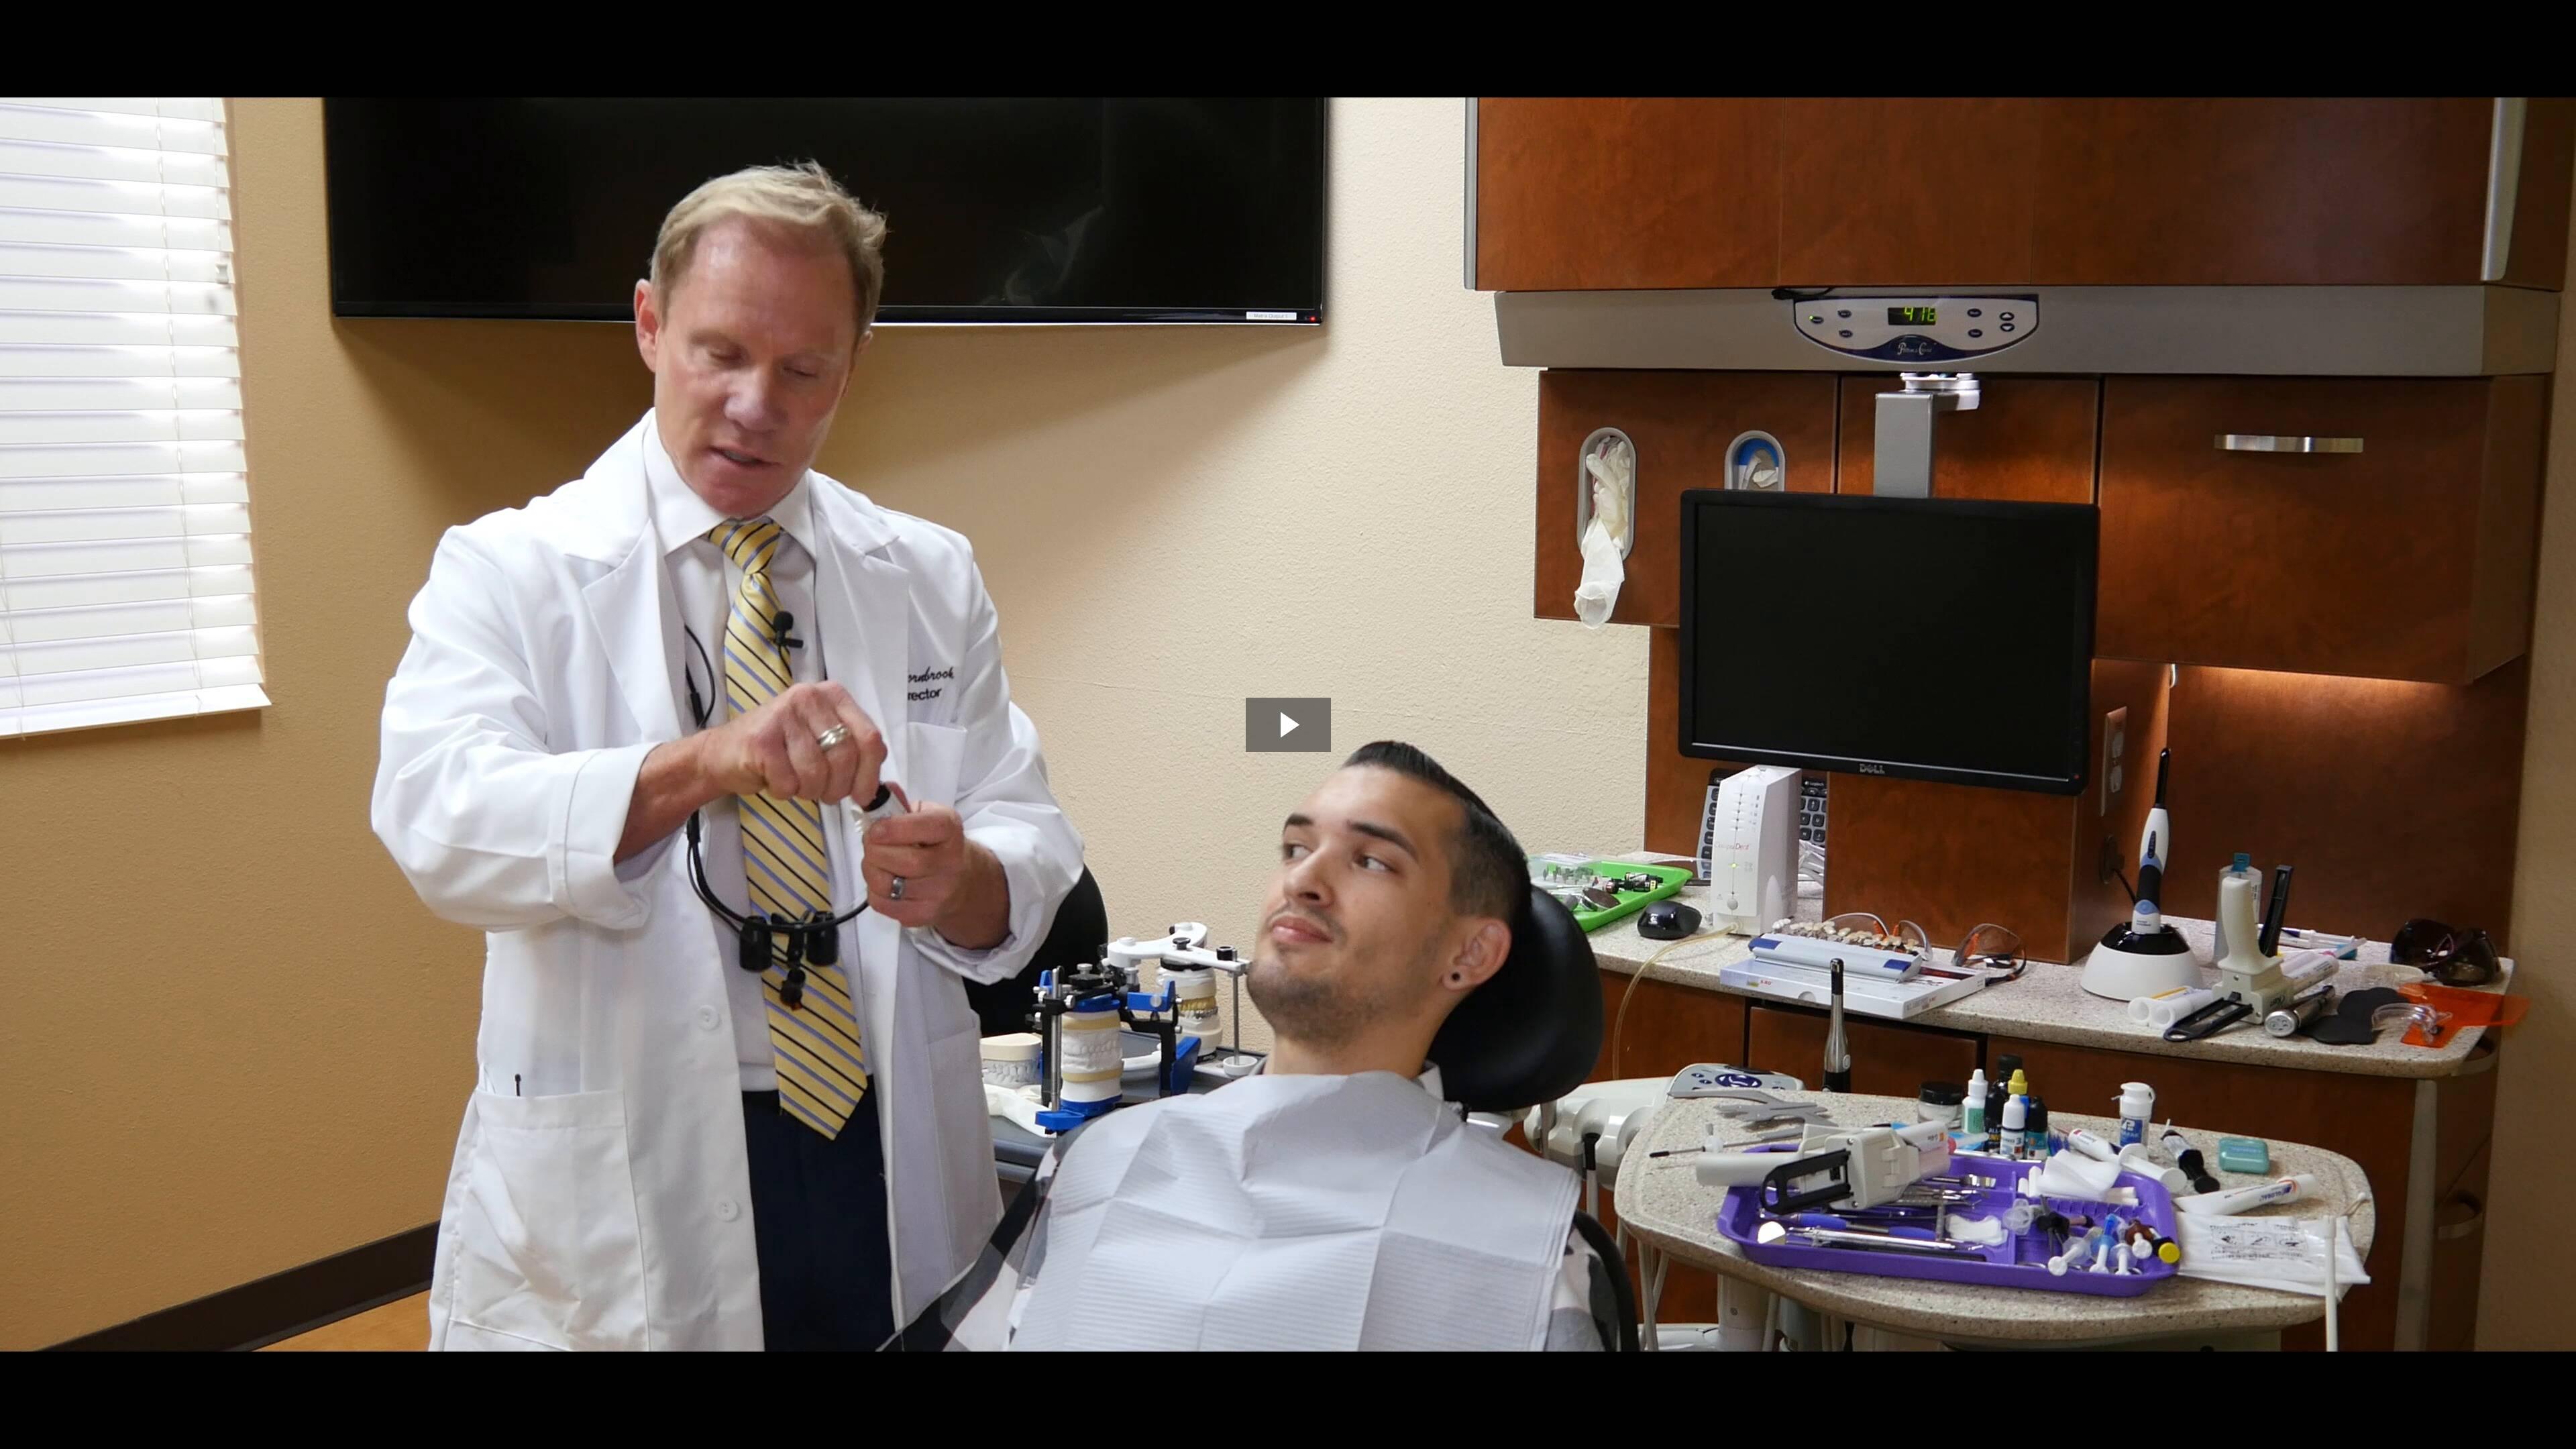 Watch Dr. Hornbrook simplifies the restorative process via Keating's 4K Ultra HD Part 2 - Dental Face Anaylzer Kois Dento Facial Analyzer video series.